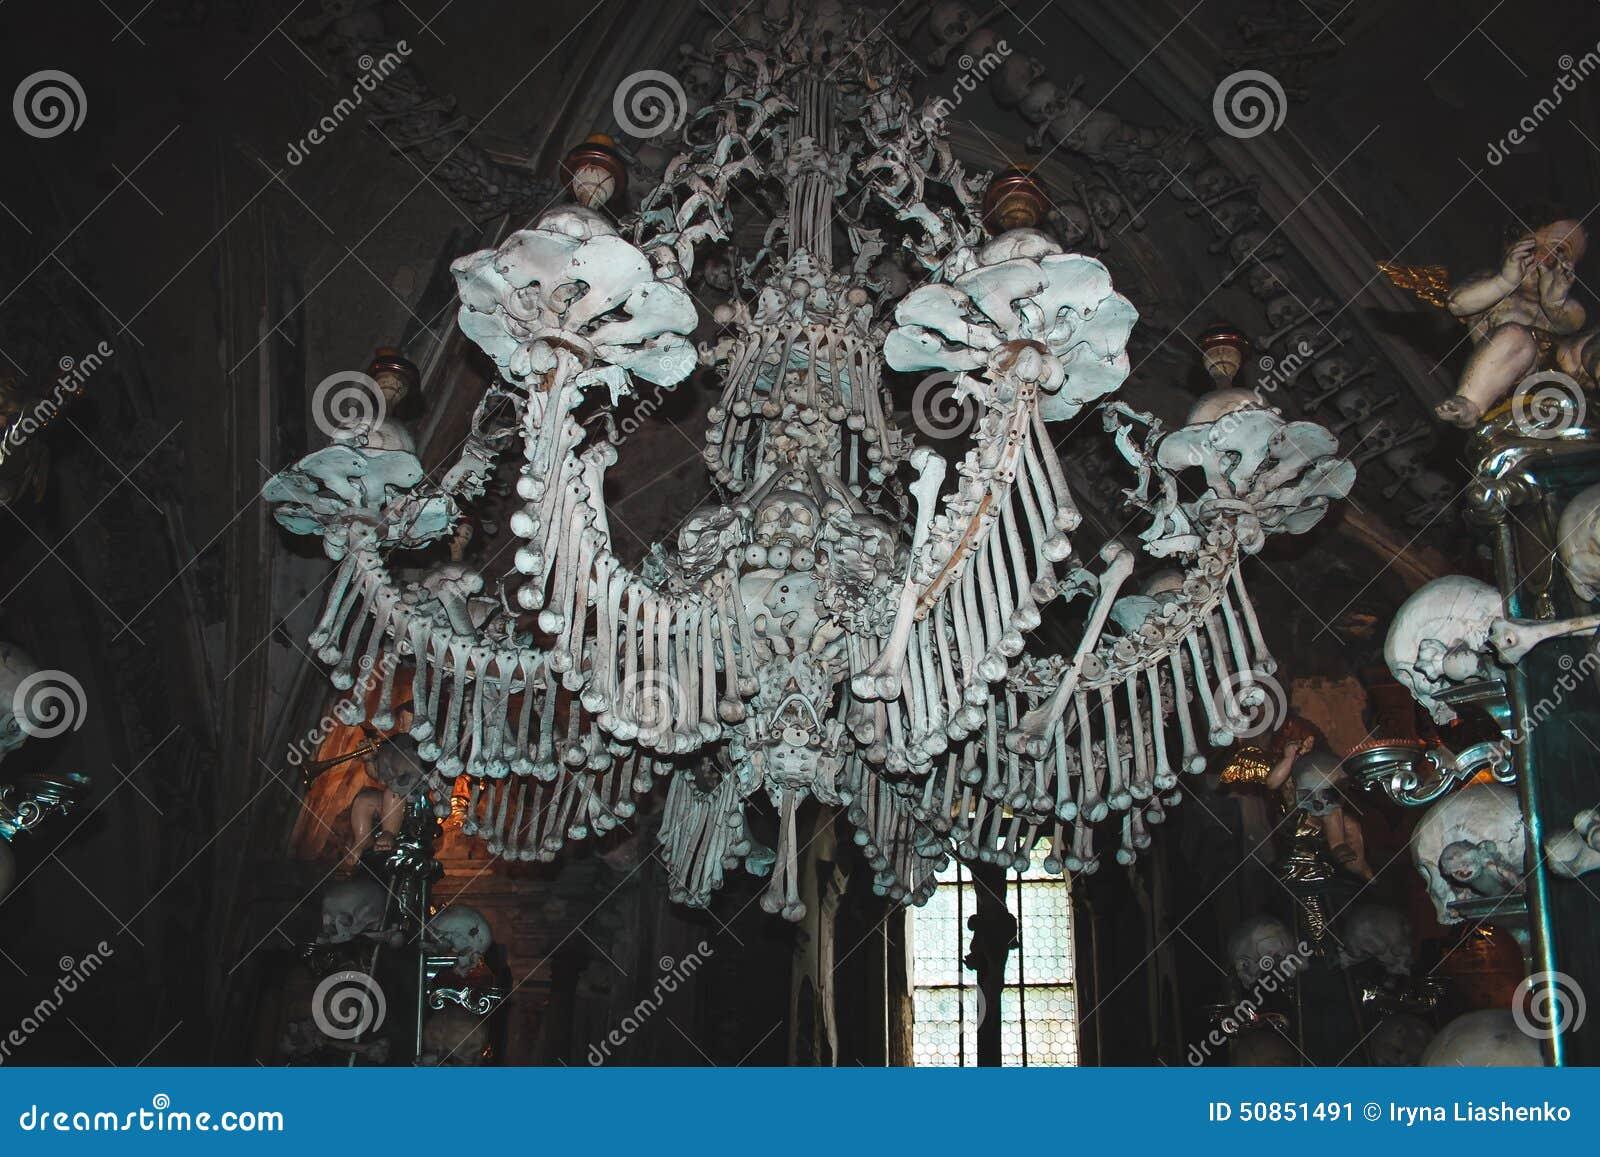 Chandelier Made On Natural Human Bones Kutna Hora Czeh Republic Stock Image